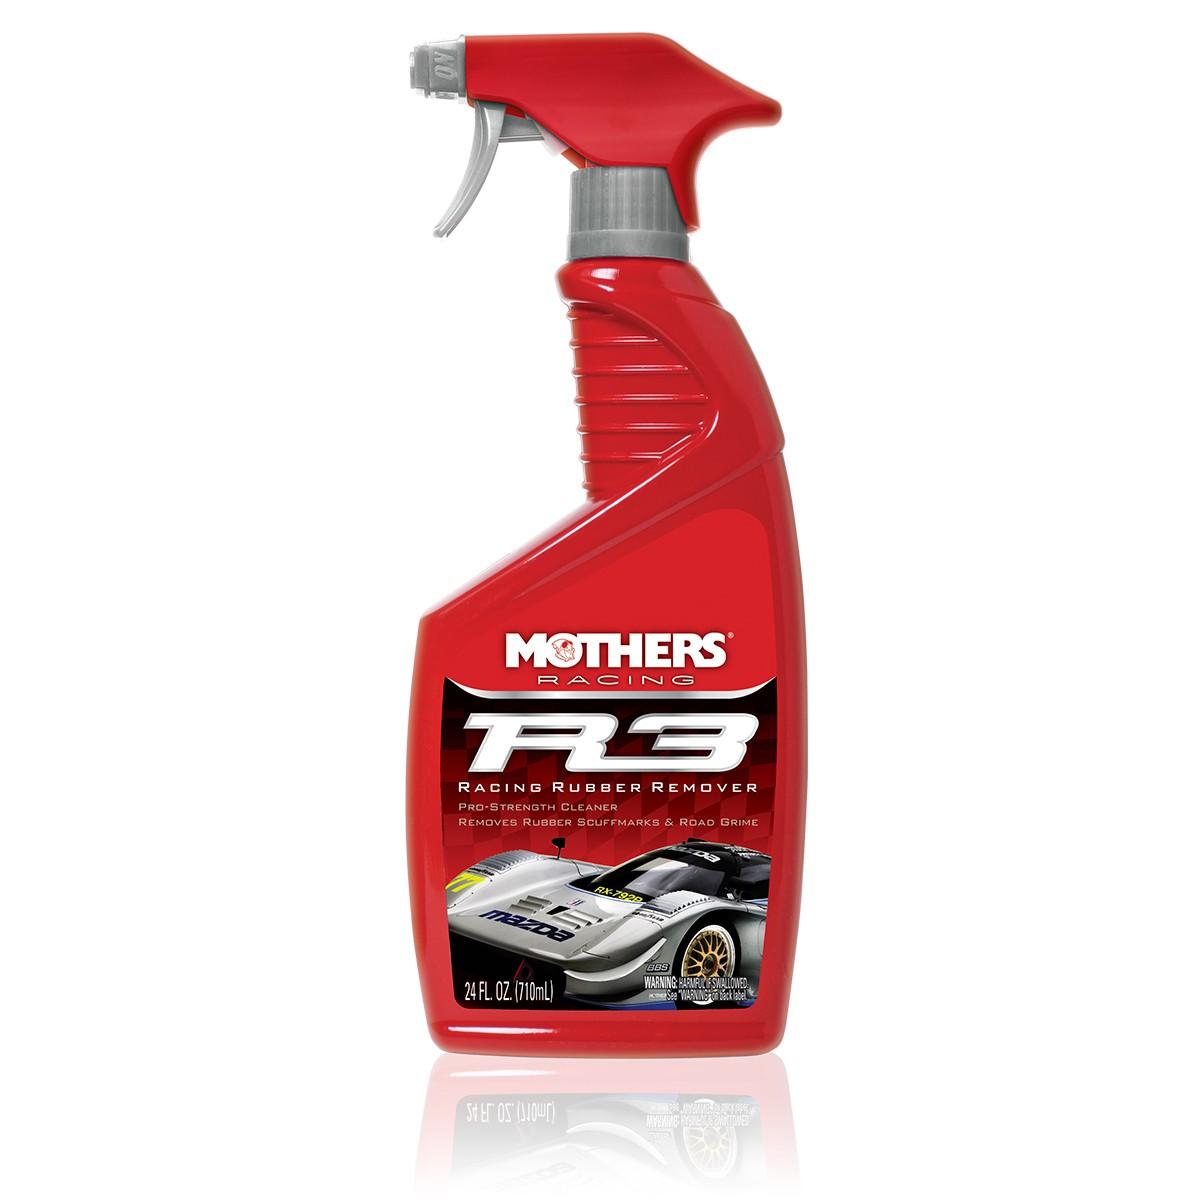 R3 Racing Rubber Remover (Removedor de Fuligem de Pista) - Mothers